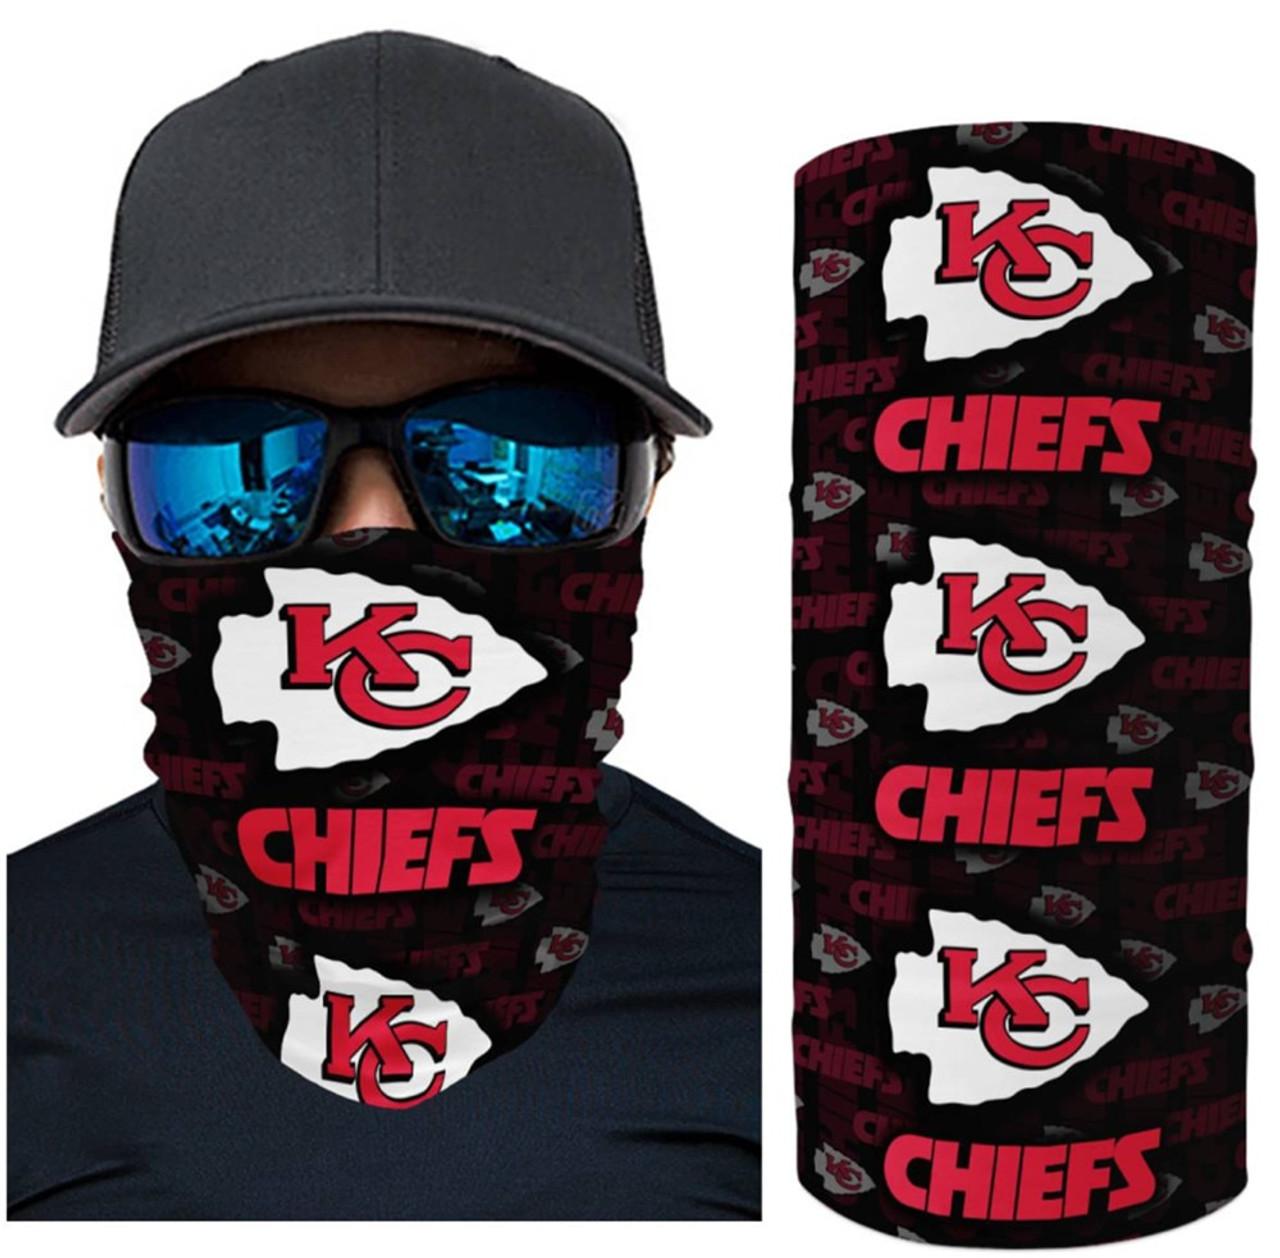 OFFICIAL-N.F.L.KANSAS-CITY-CHIEFS-FACE-MASK & GAITER-NECK-SCARFS/MULTI-USE-NFL.TEAM-SPORT-FACE-MASK!